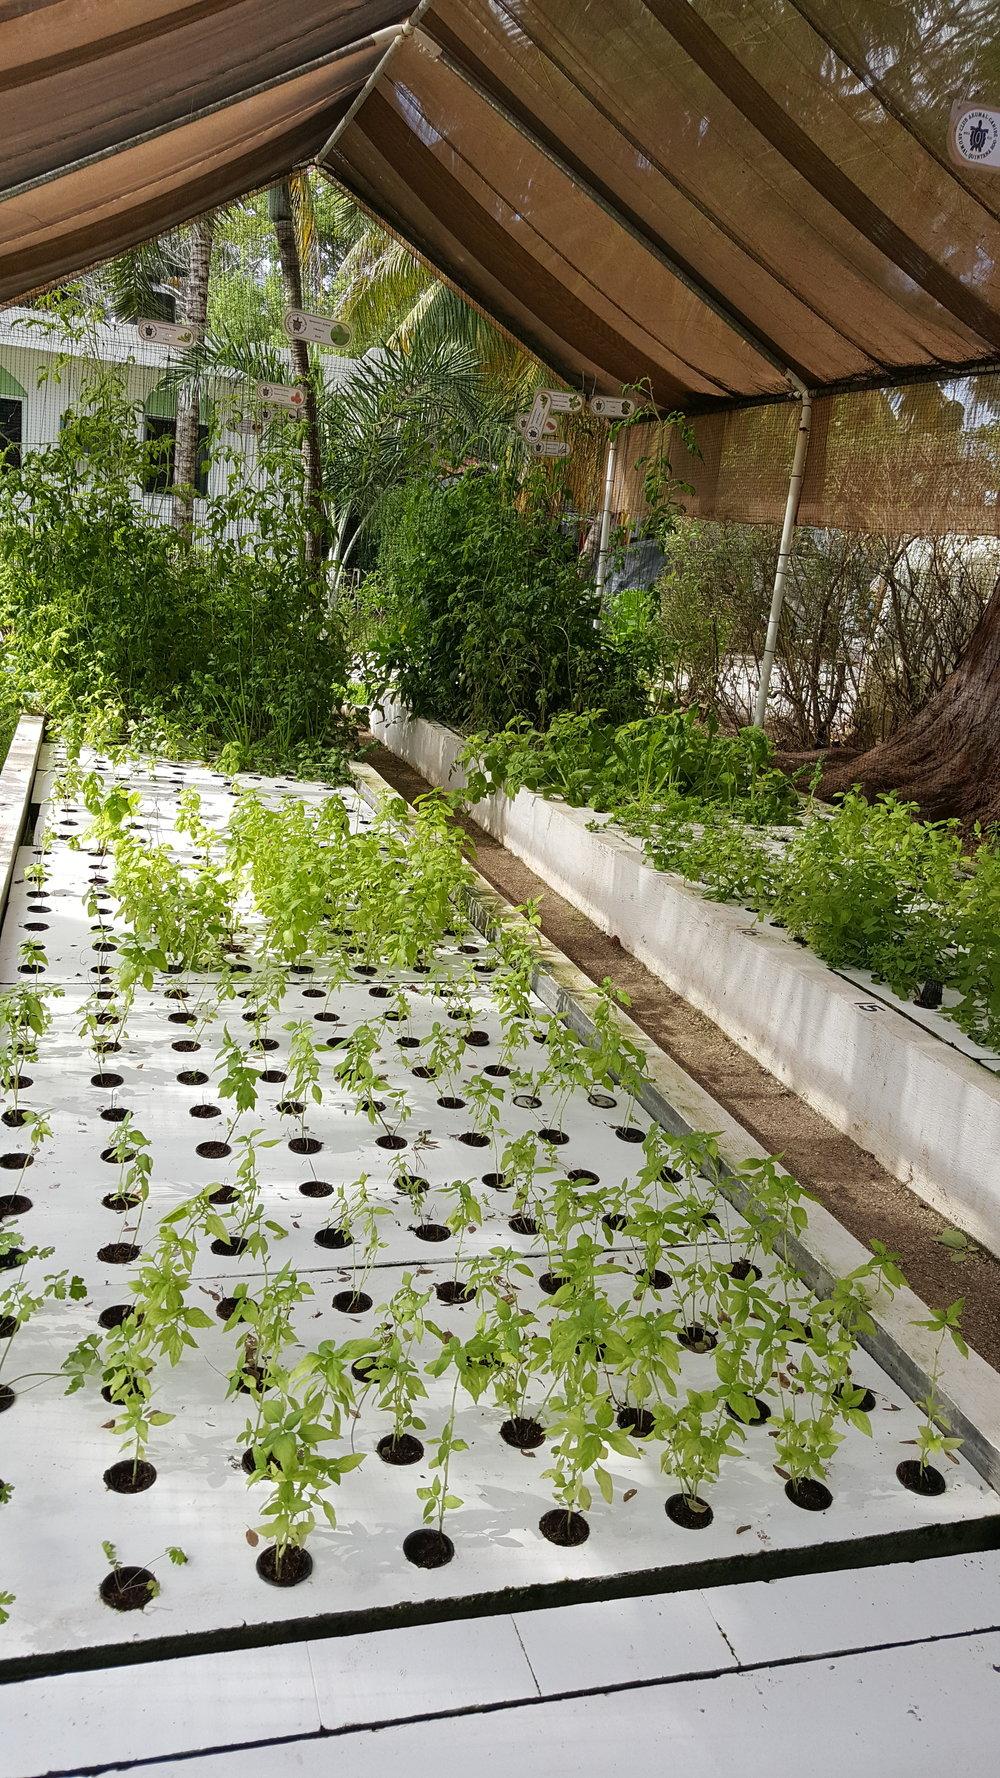 Hydroponic garden - Hotel Akumal Caribe